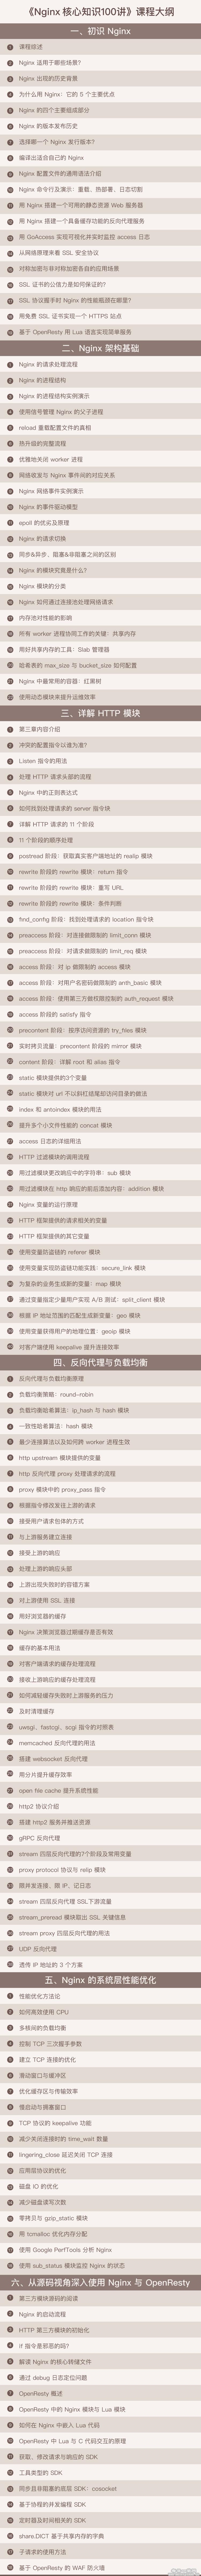 Nginx核心知识100讲网盘资源,陶辉主讲